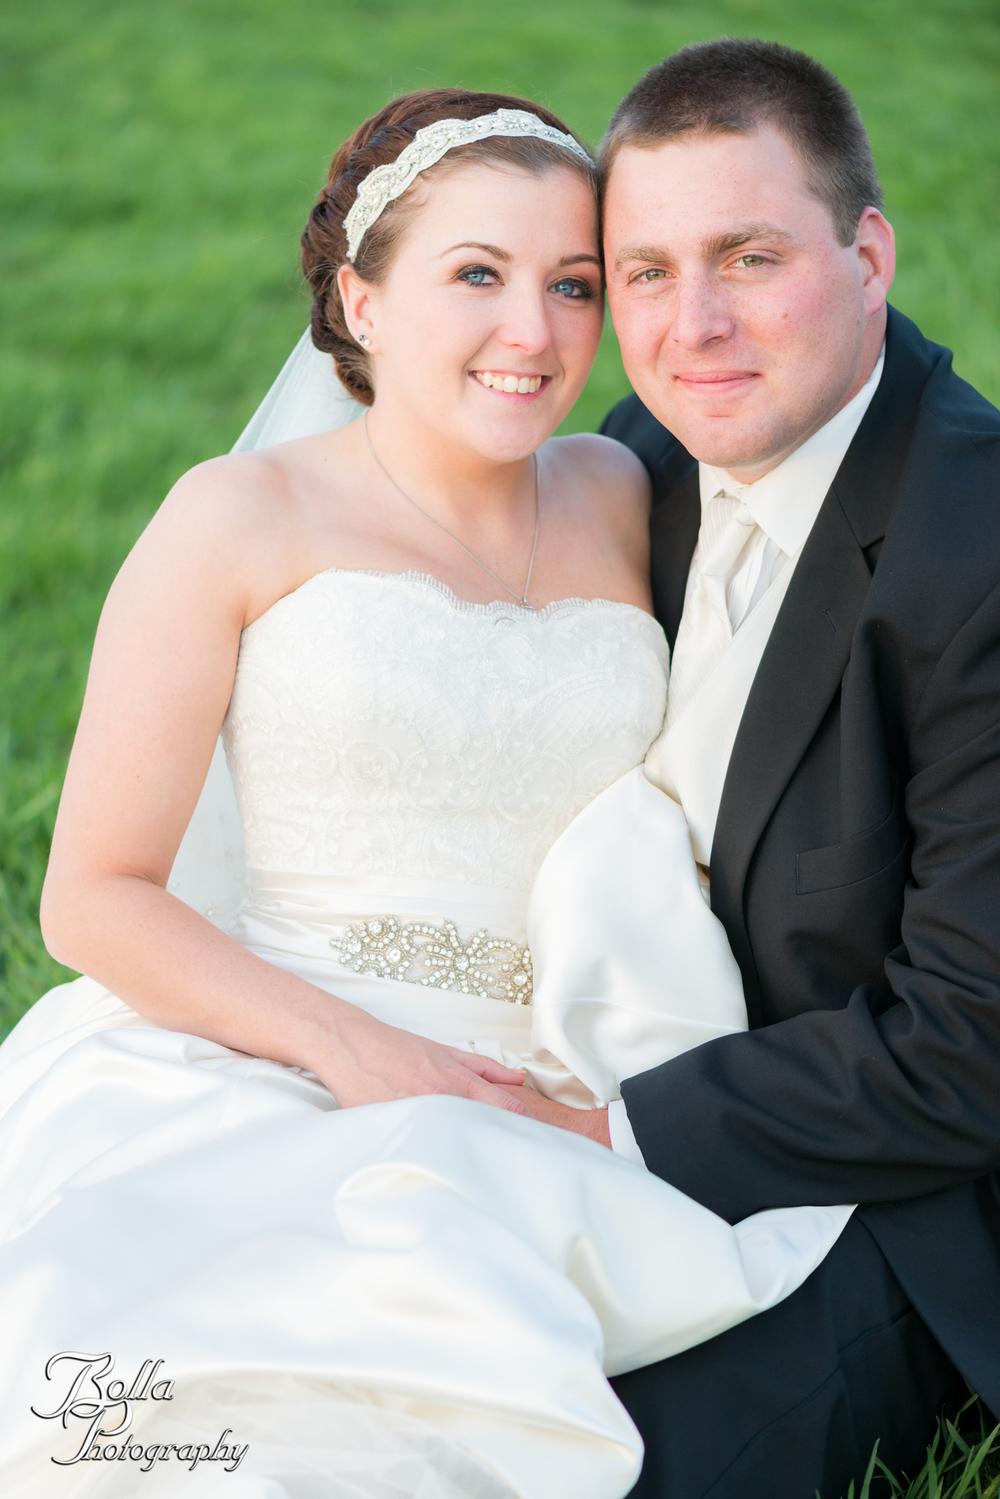 Bolla_Photography_St_Louis_wedding_photographer-0296.jpg